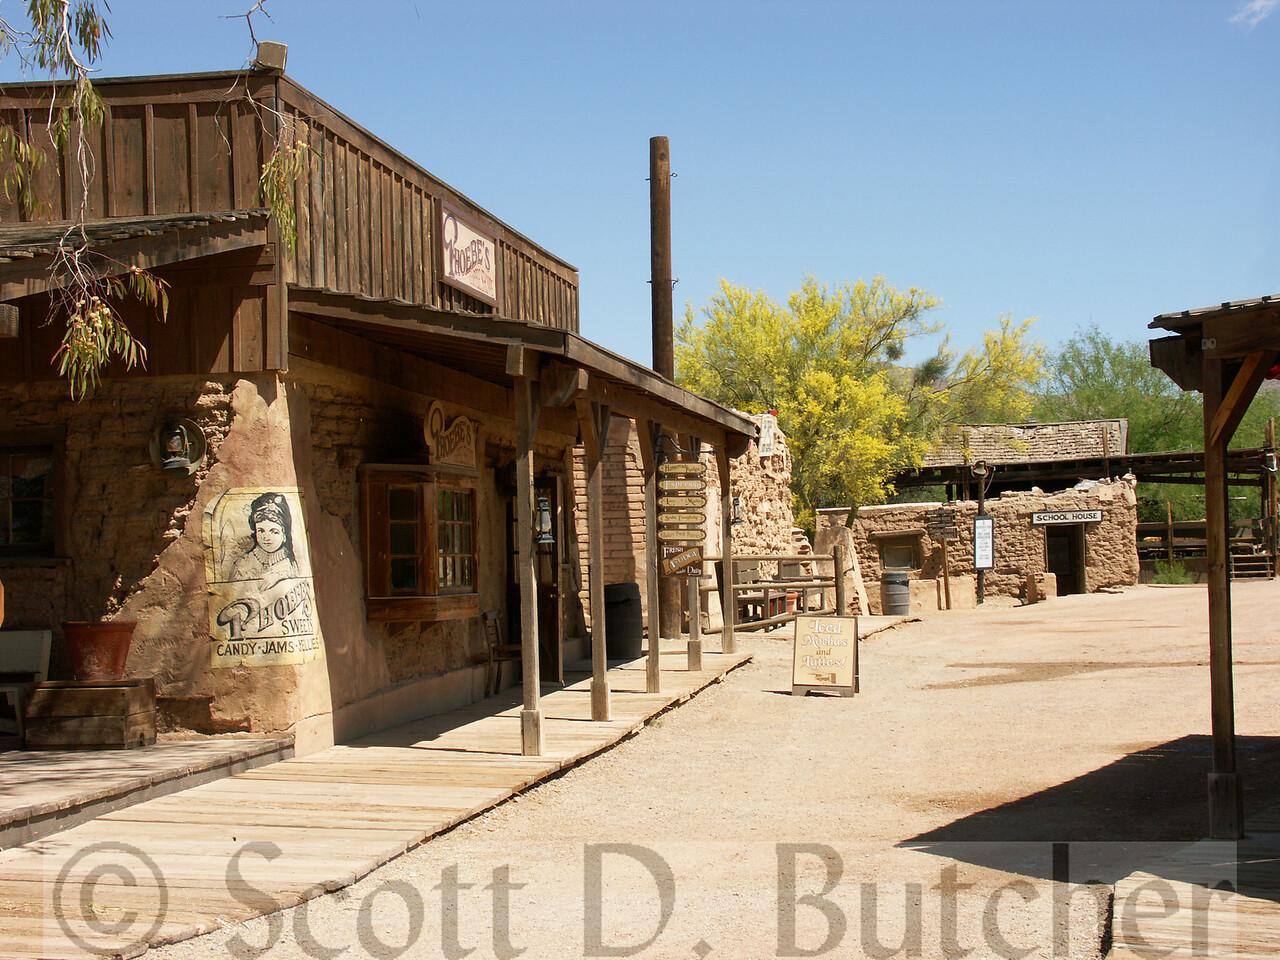 Old Tucson Studios